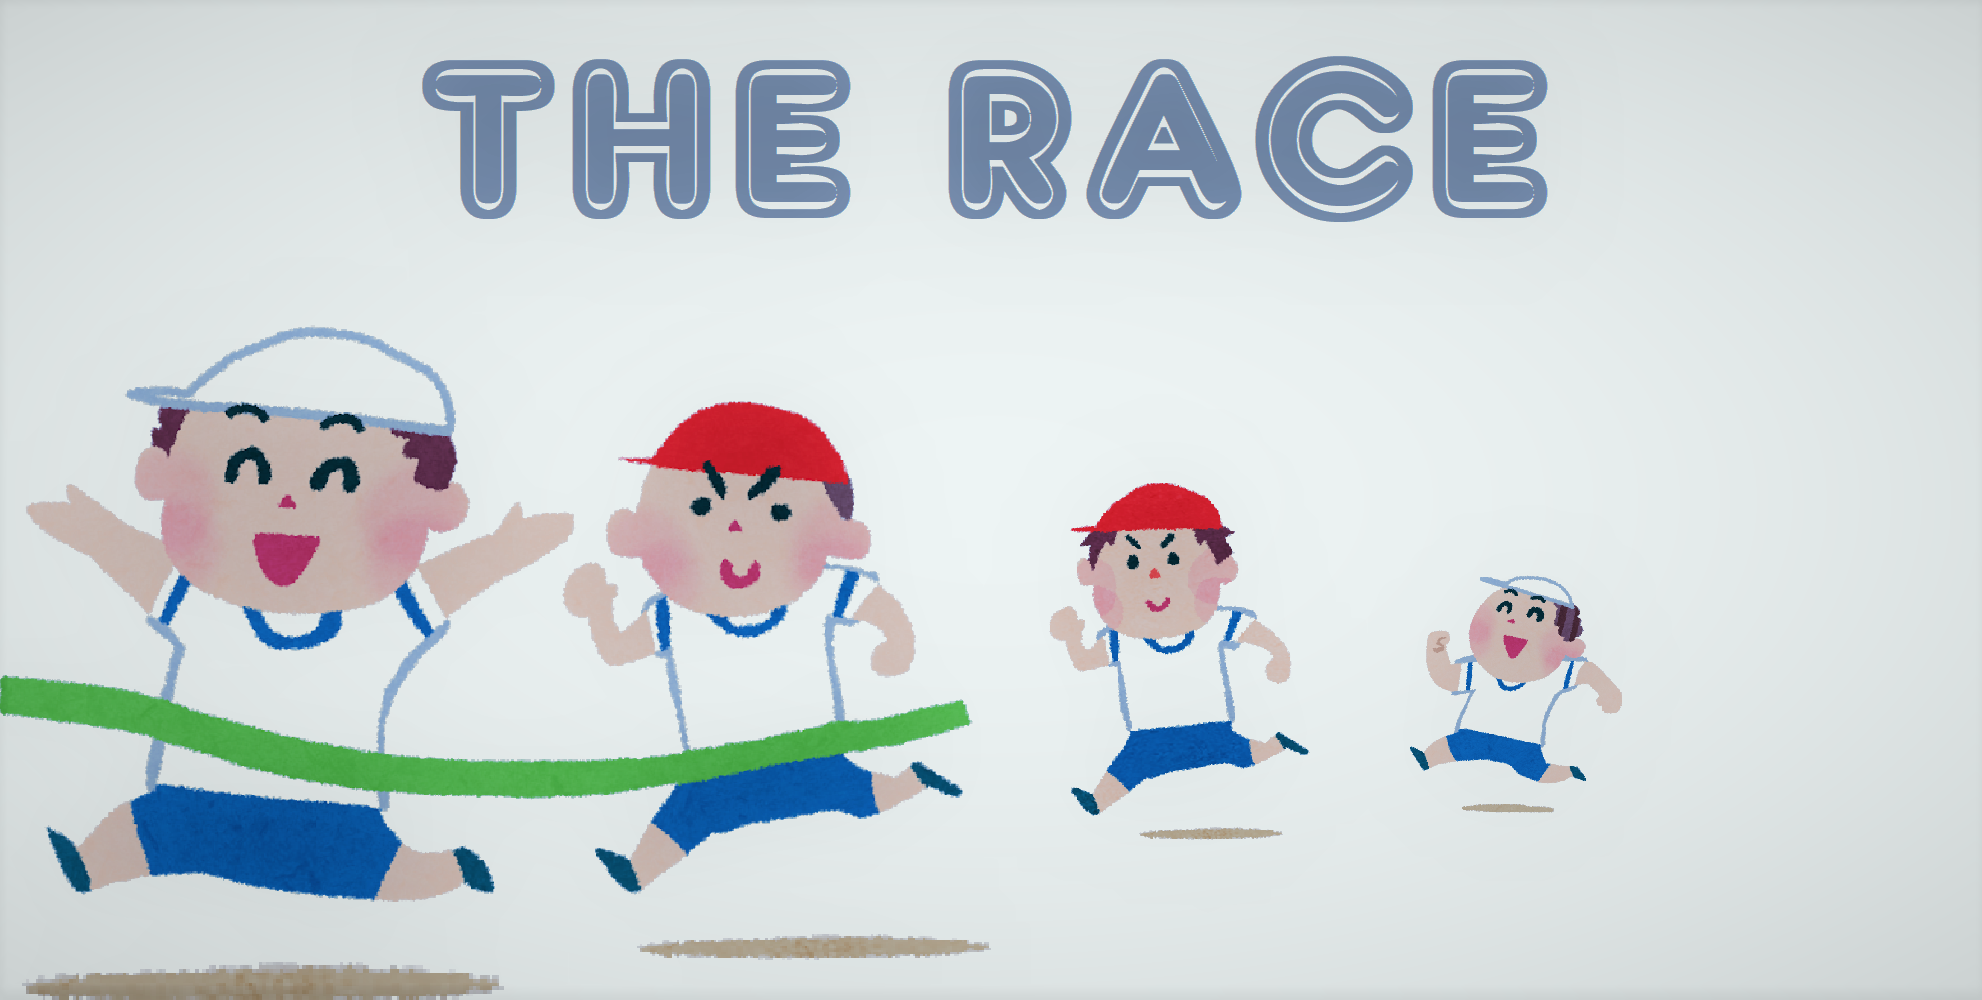 「THE RACE」のイメージ